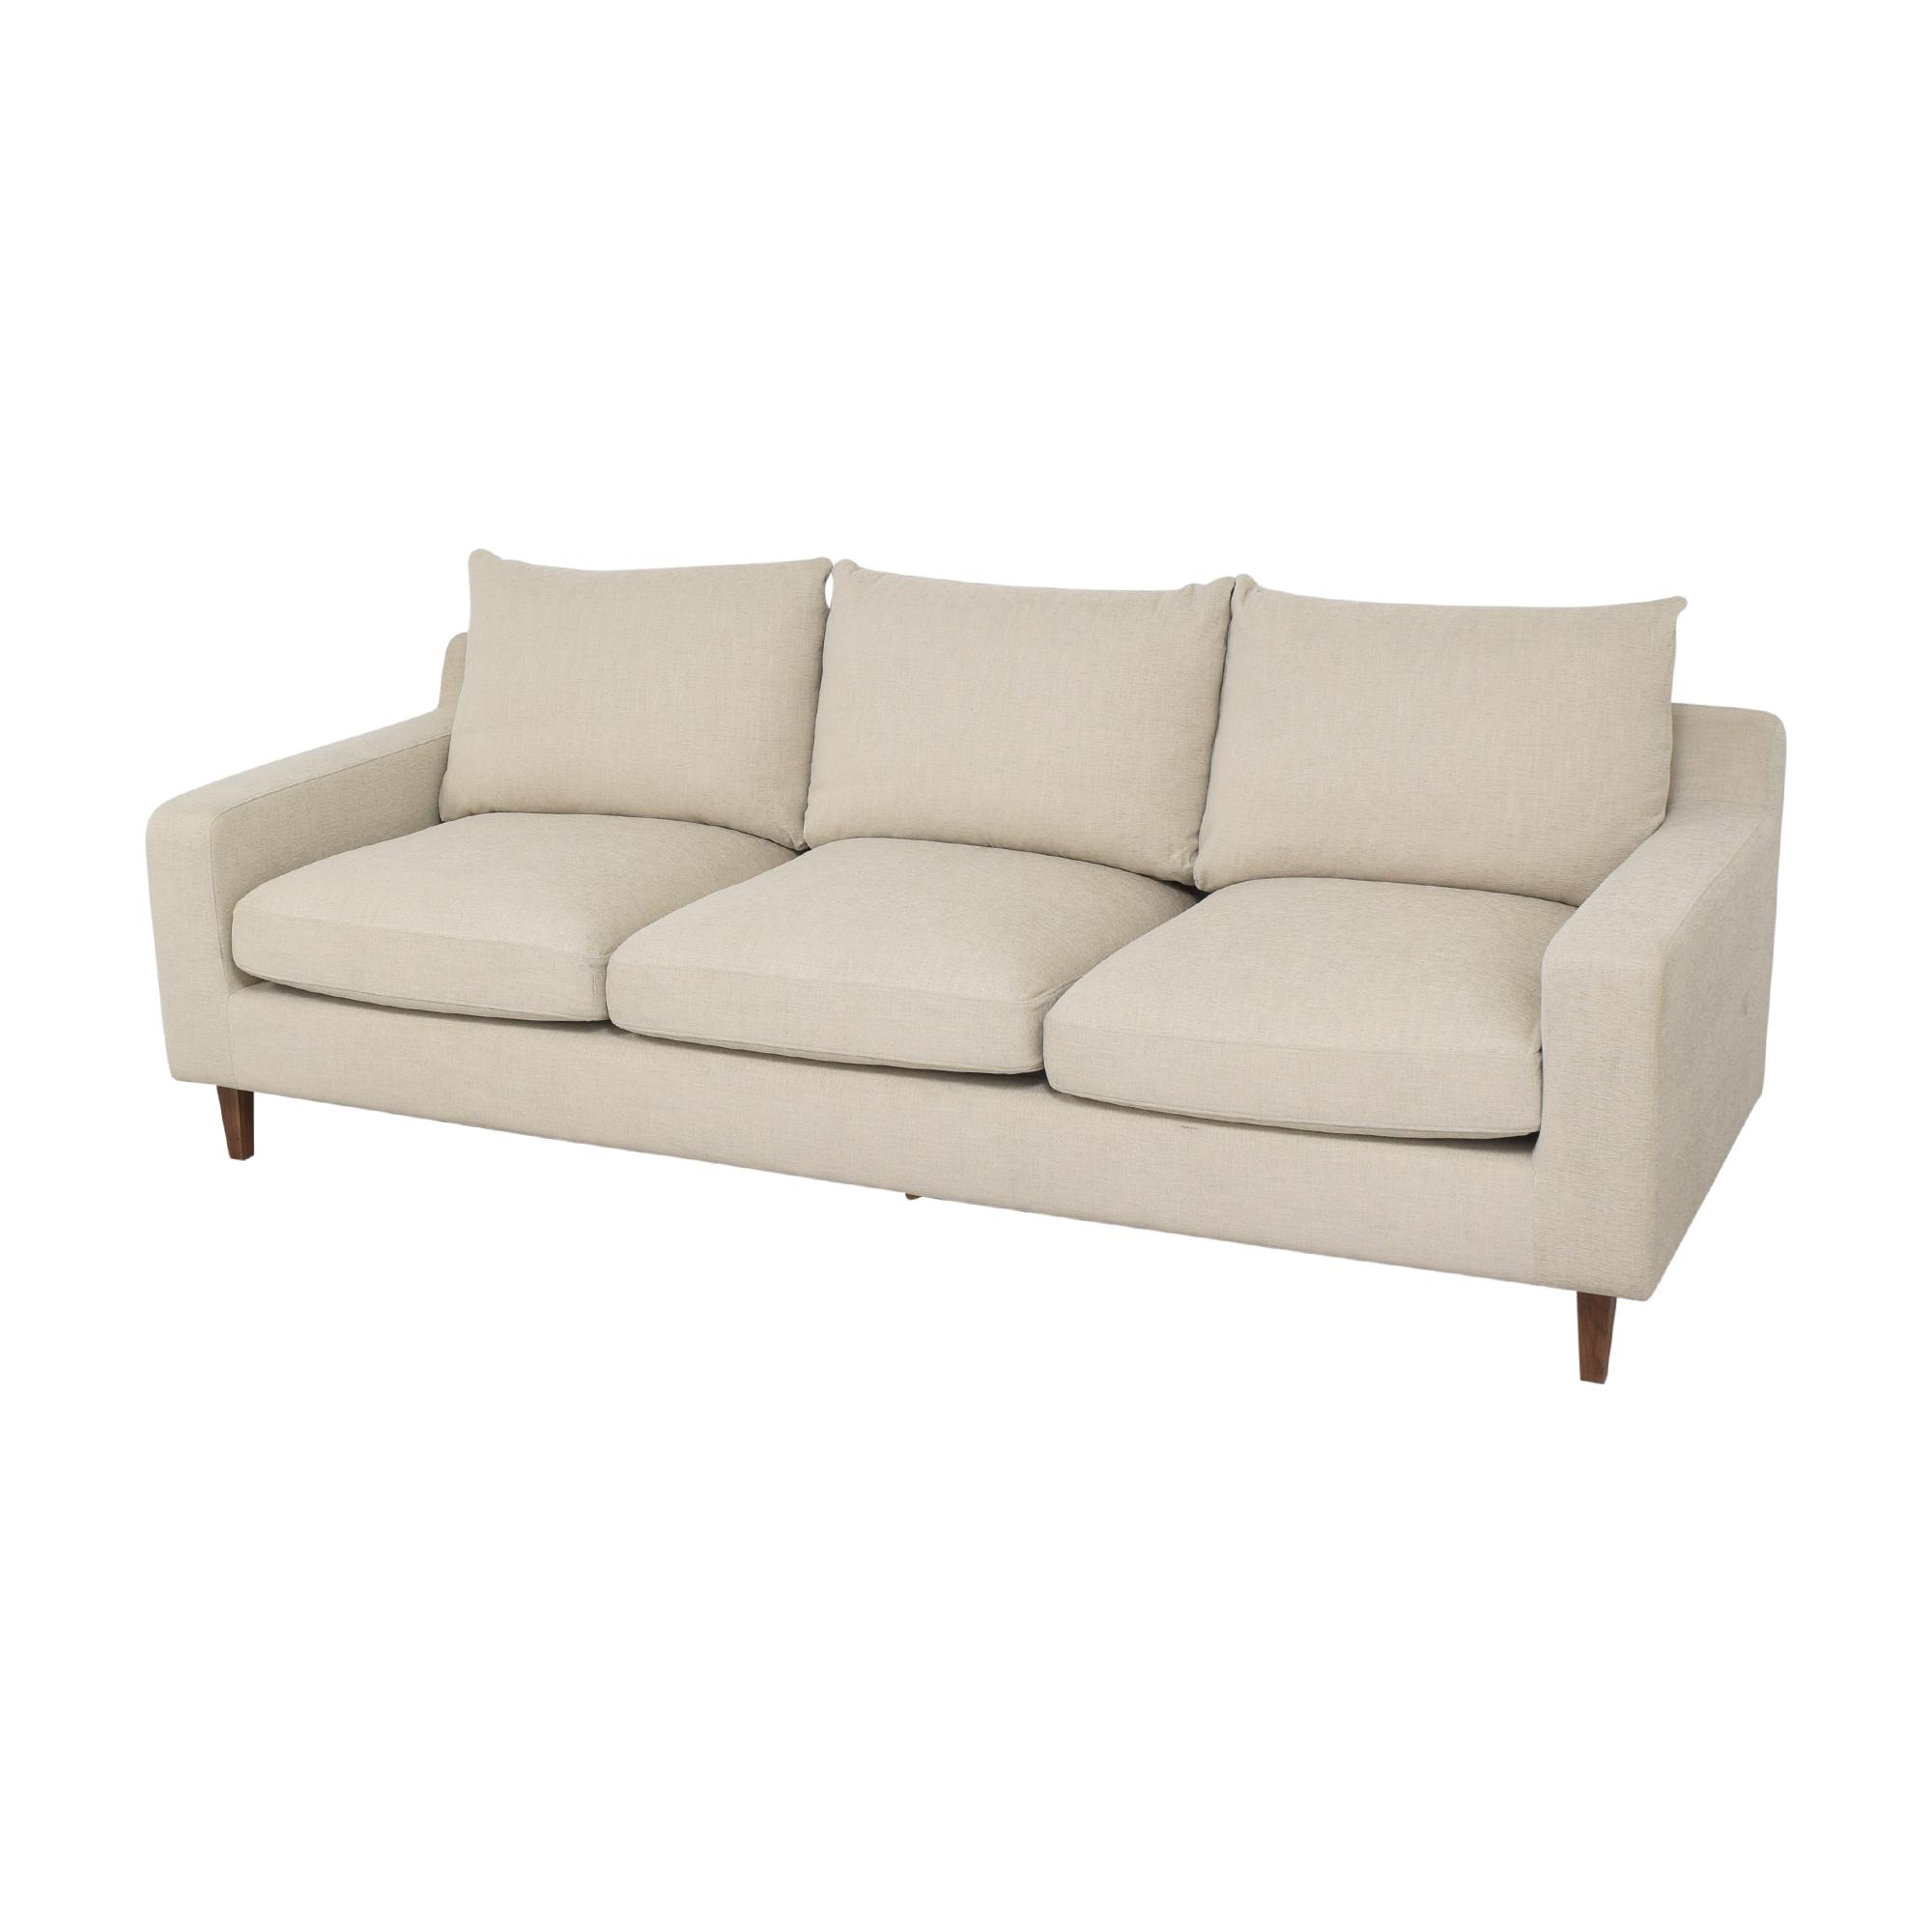 Interior Define Interior Define Sloan 3-Seat Sofa Classic Sofas